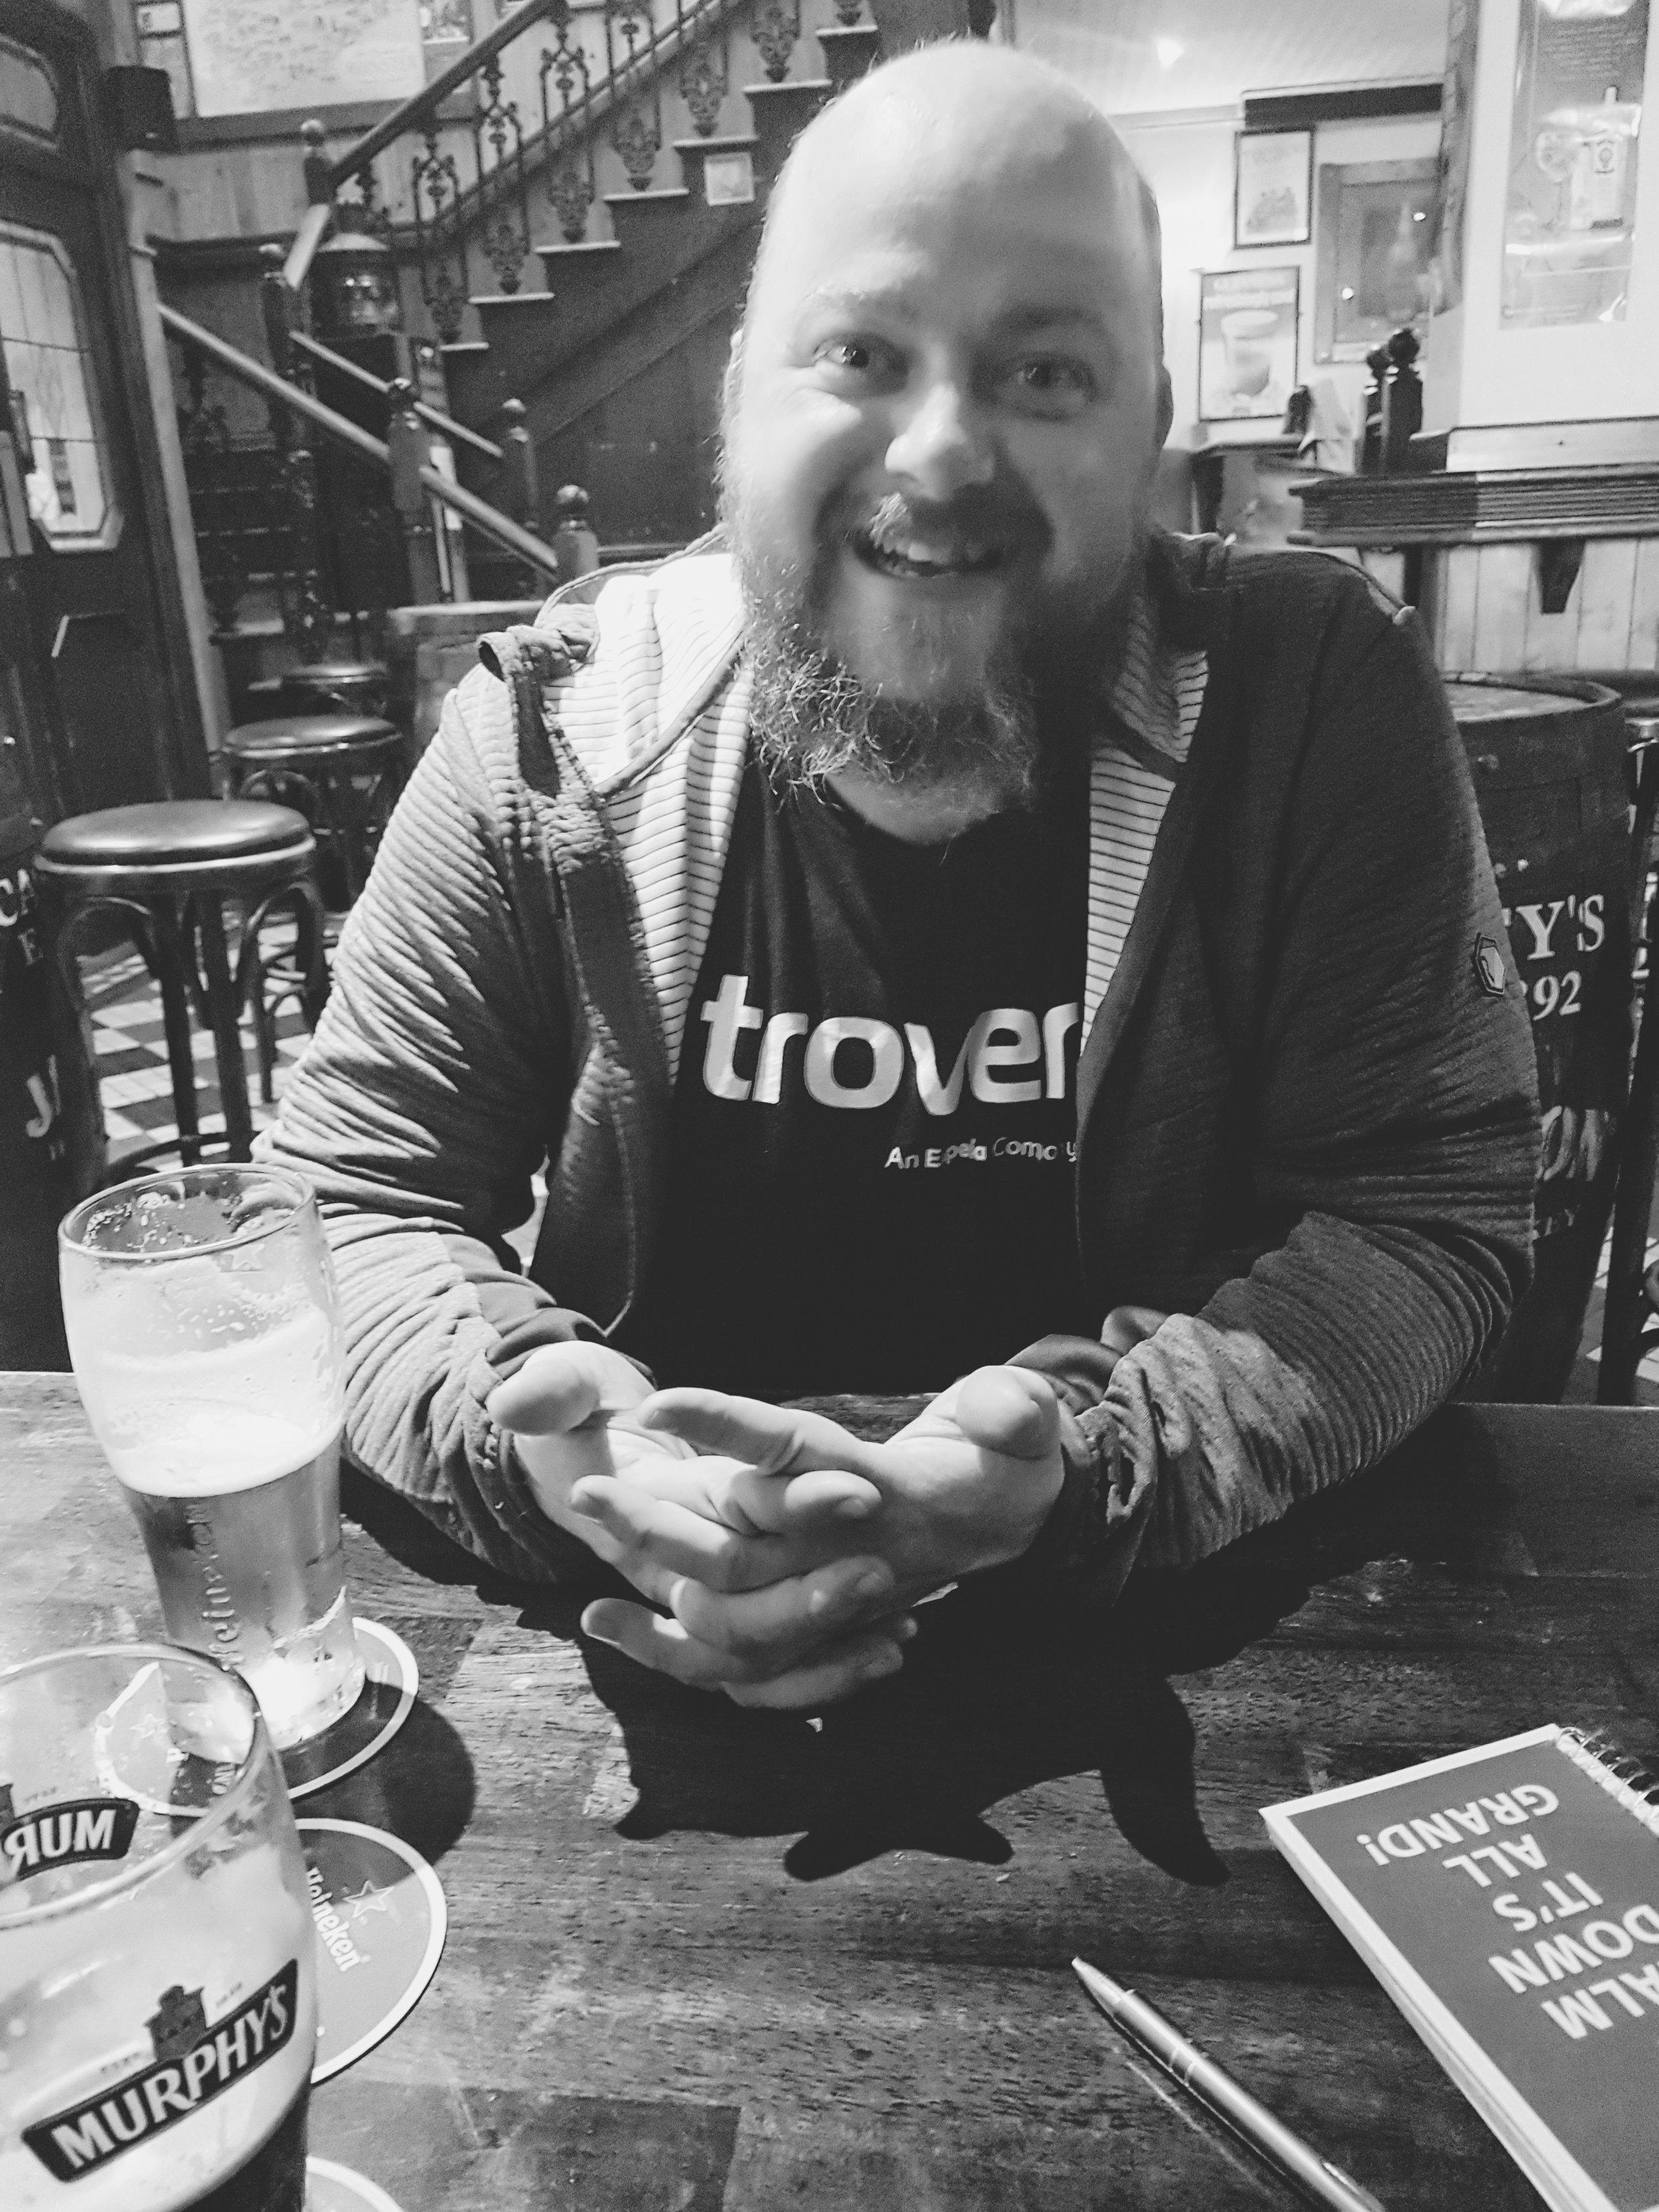 county cork. cork. ireland. irish. history. city. house sitting. old. travel. travel photography. travel photographer.  havining fun in the pub. beer. trover.jpg